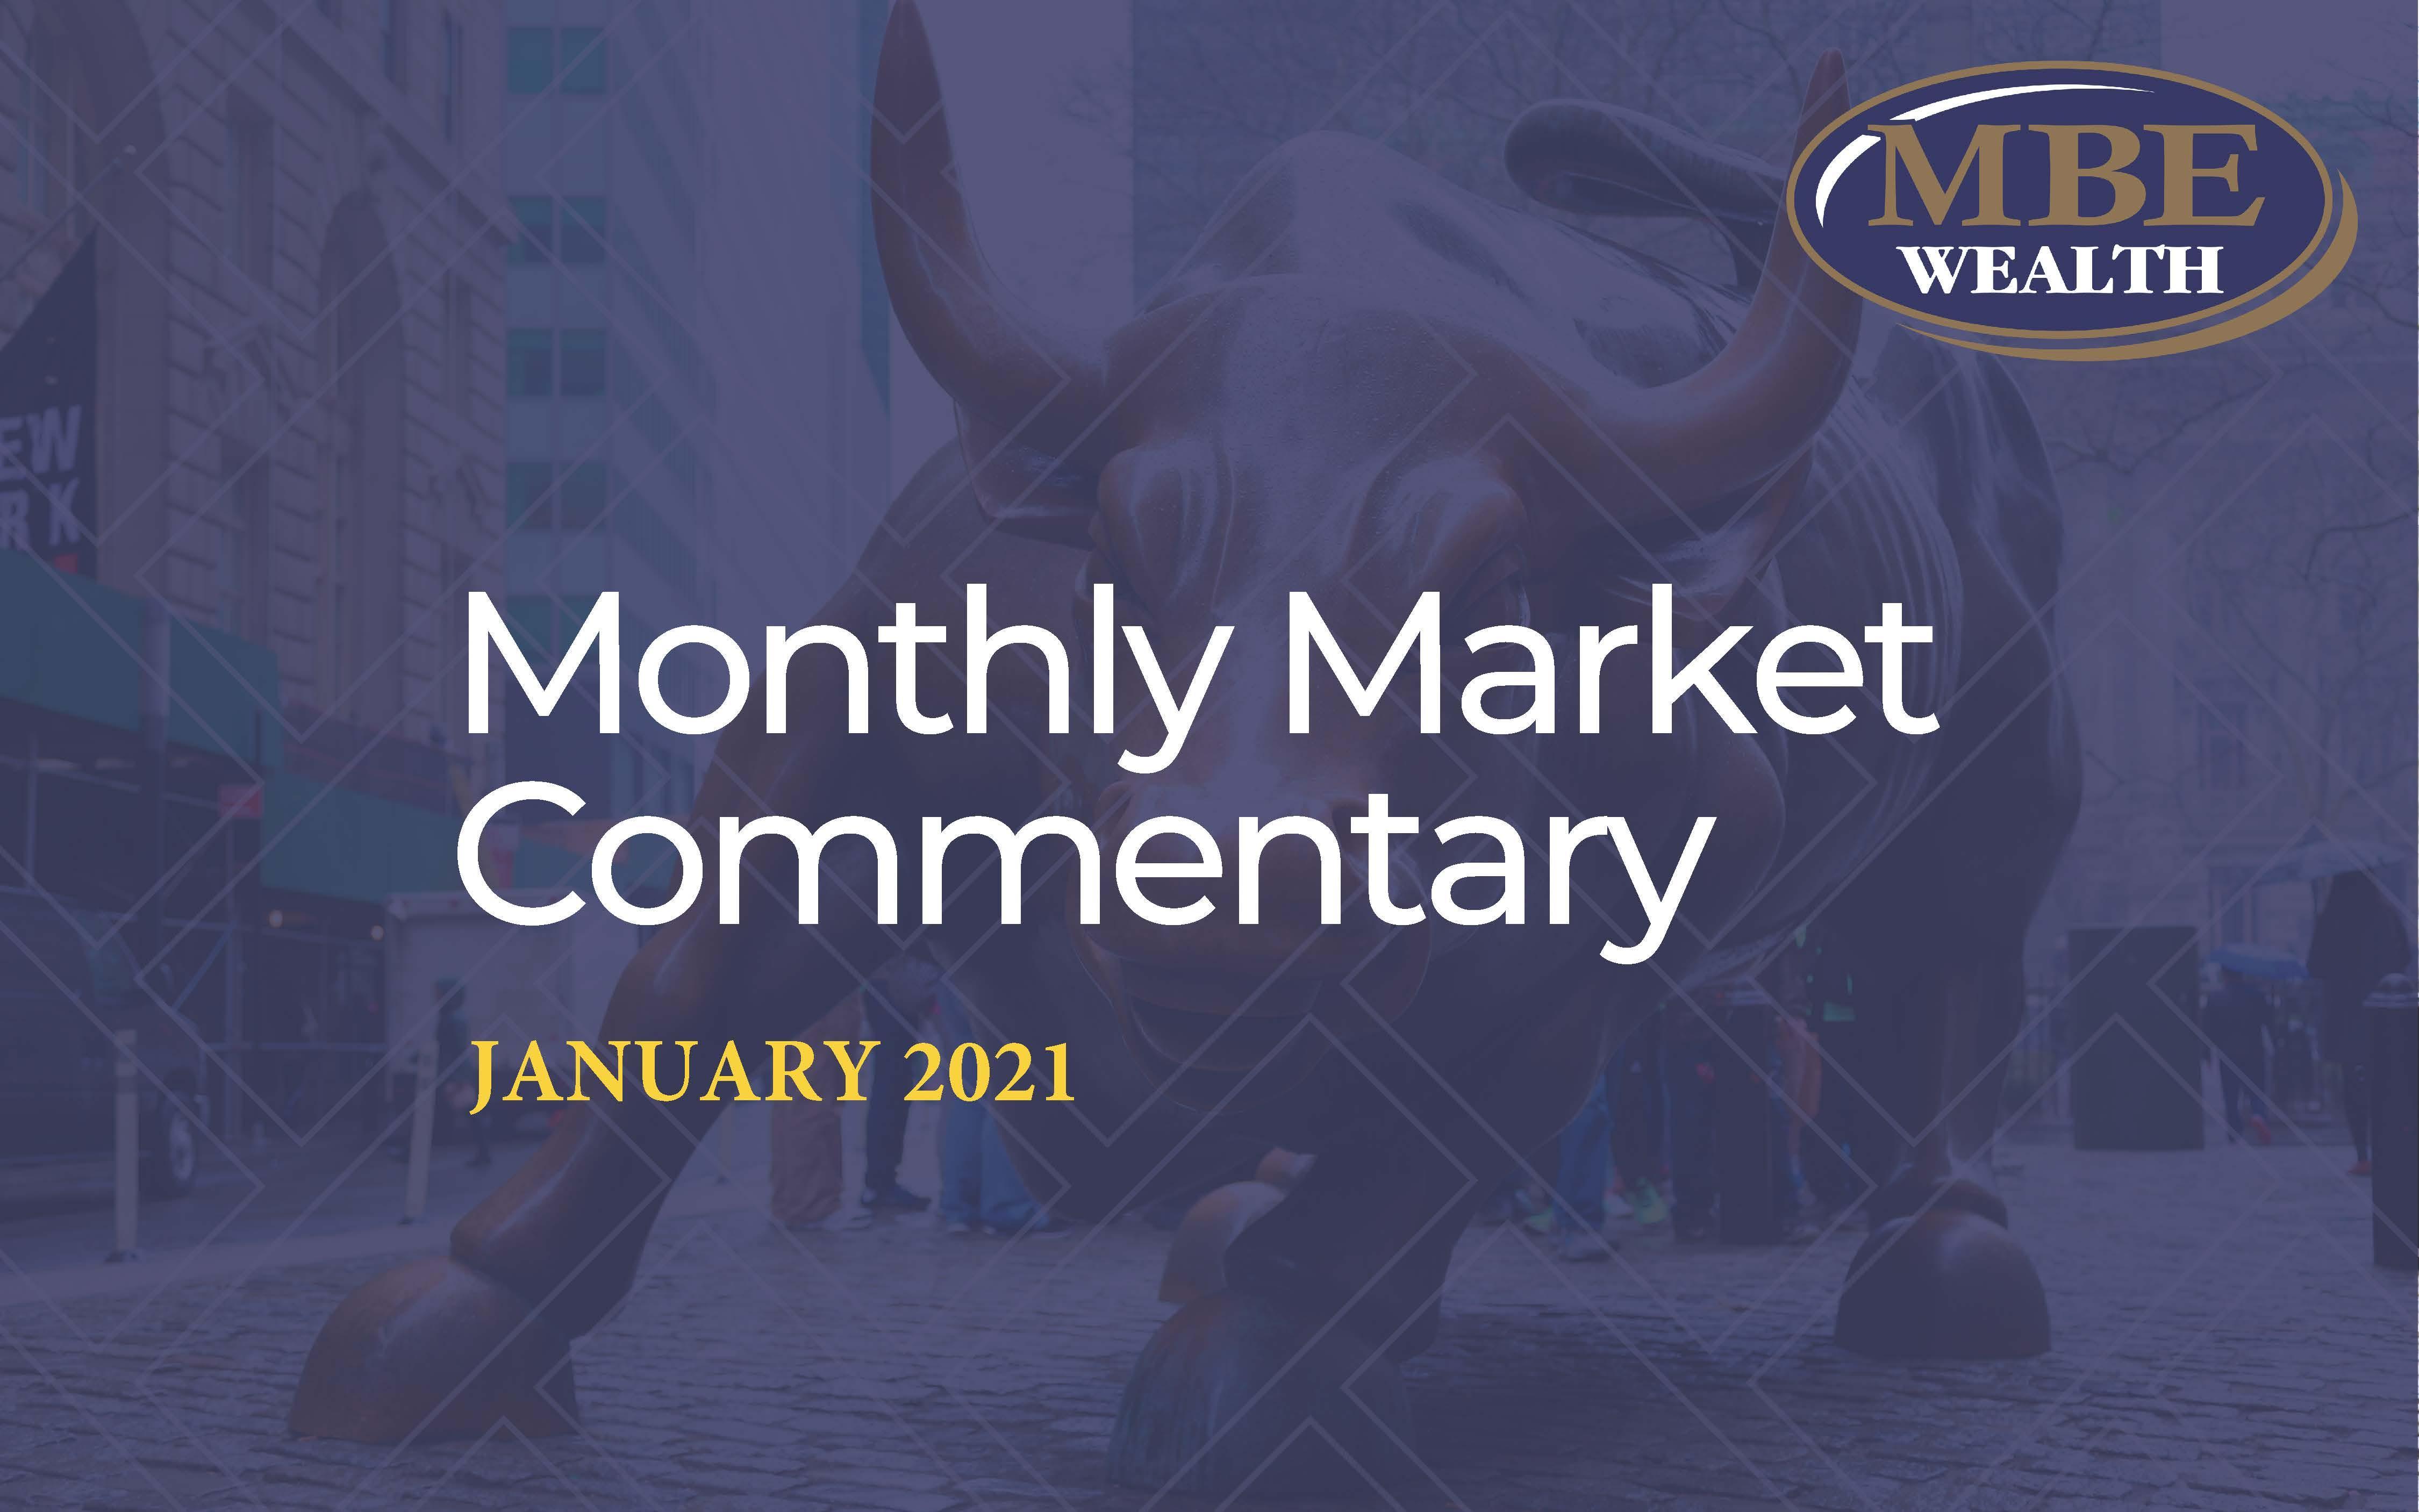 January 2021 MBE Wealth Market Commentary Thumbnail